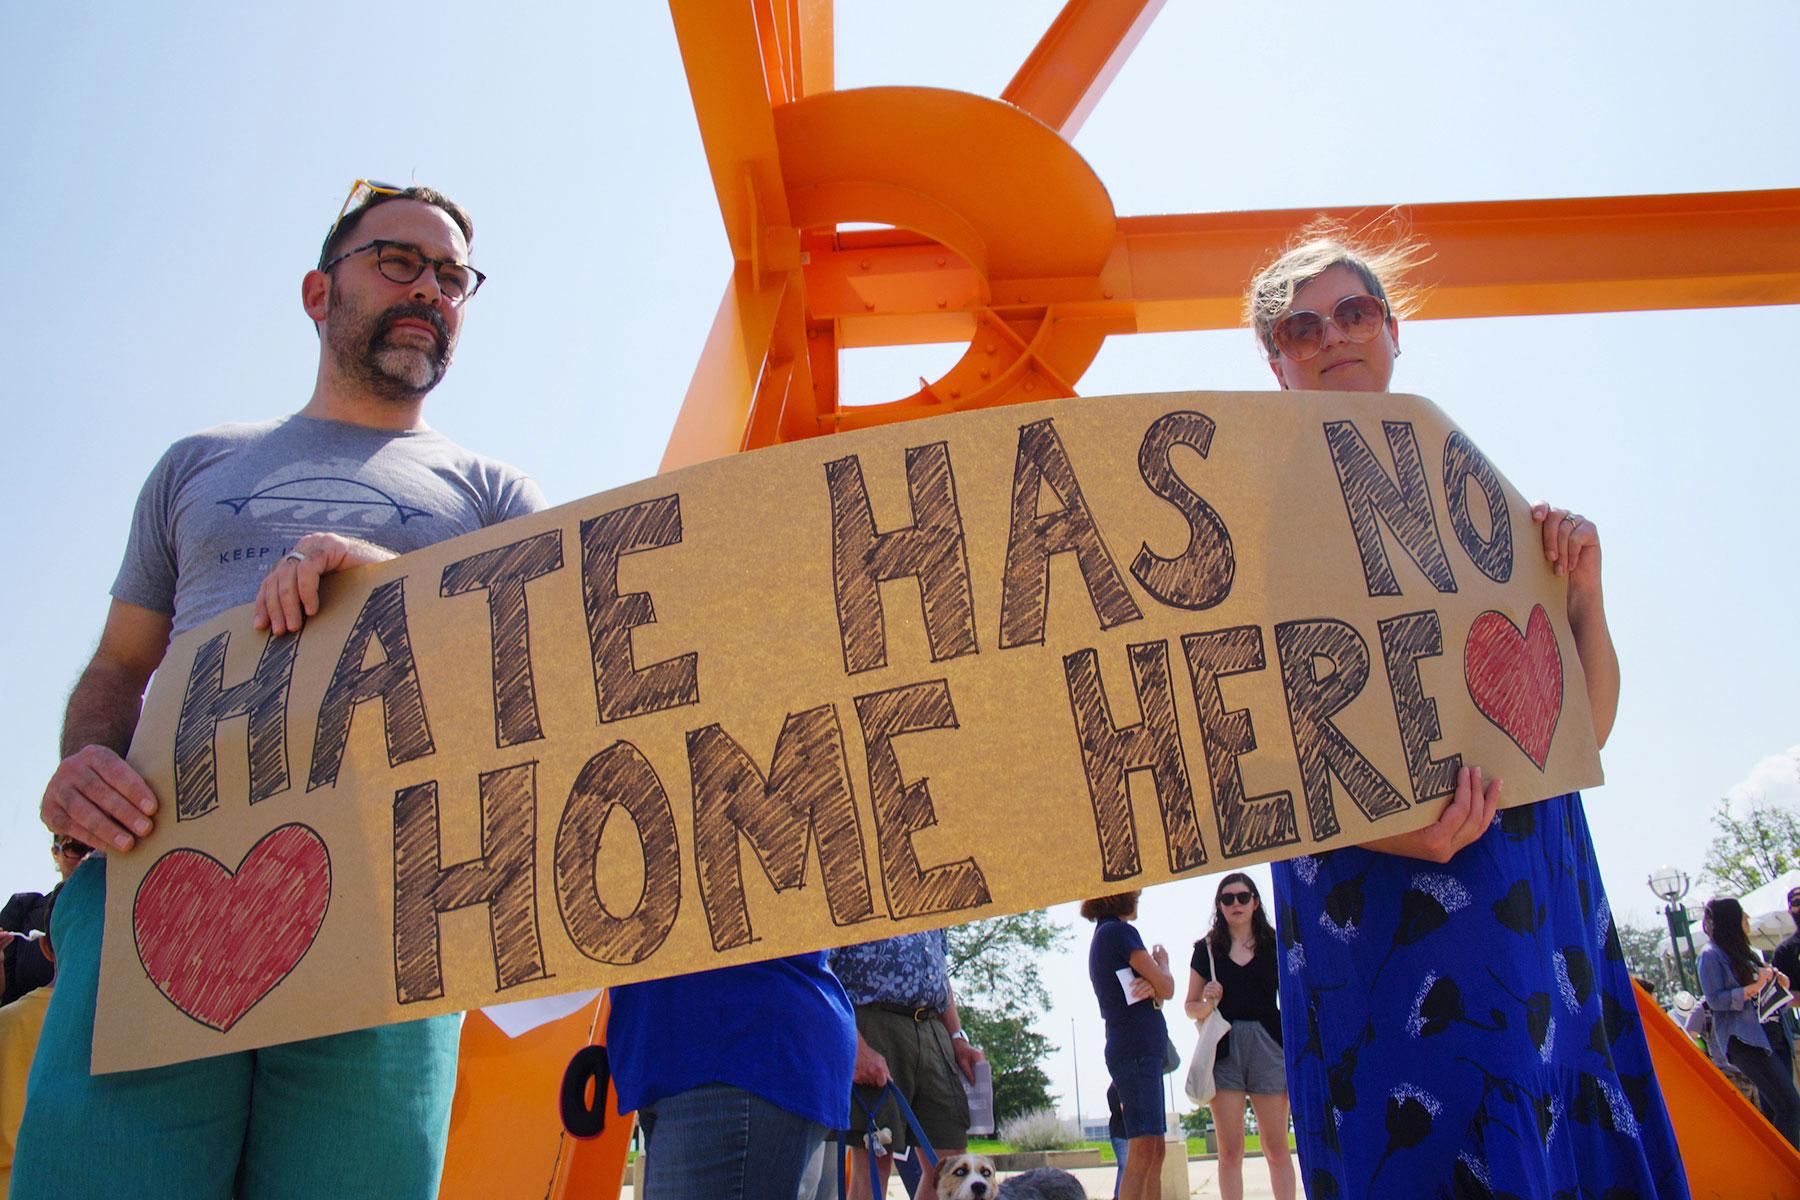 081917_whitepowerprotest_0017